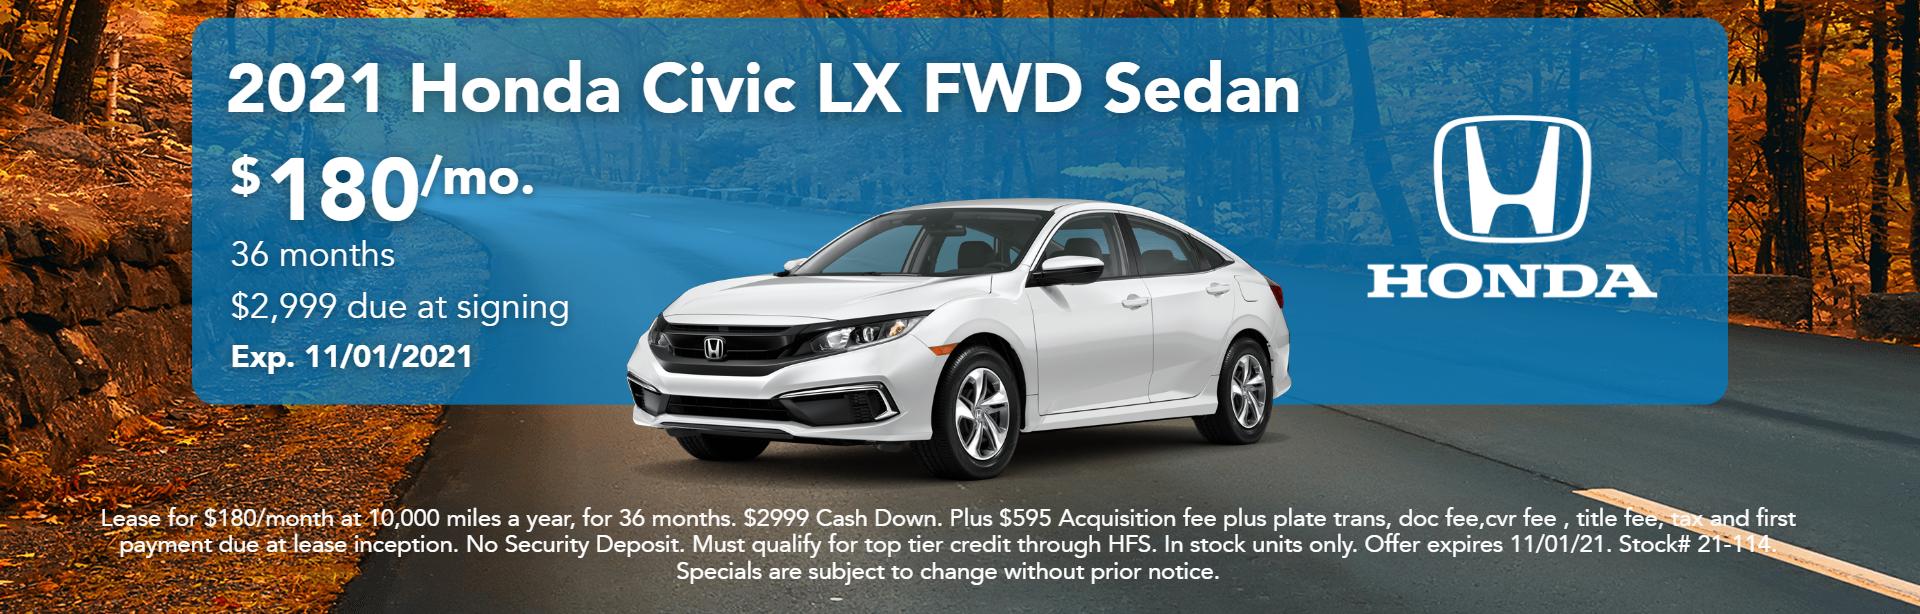 2021_Honda_Civic_Sedan LX_Tue Oct 05 2021 13_10_54 GMT-0400 (Eastern Daylight Time)